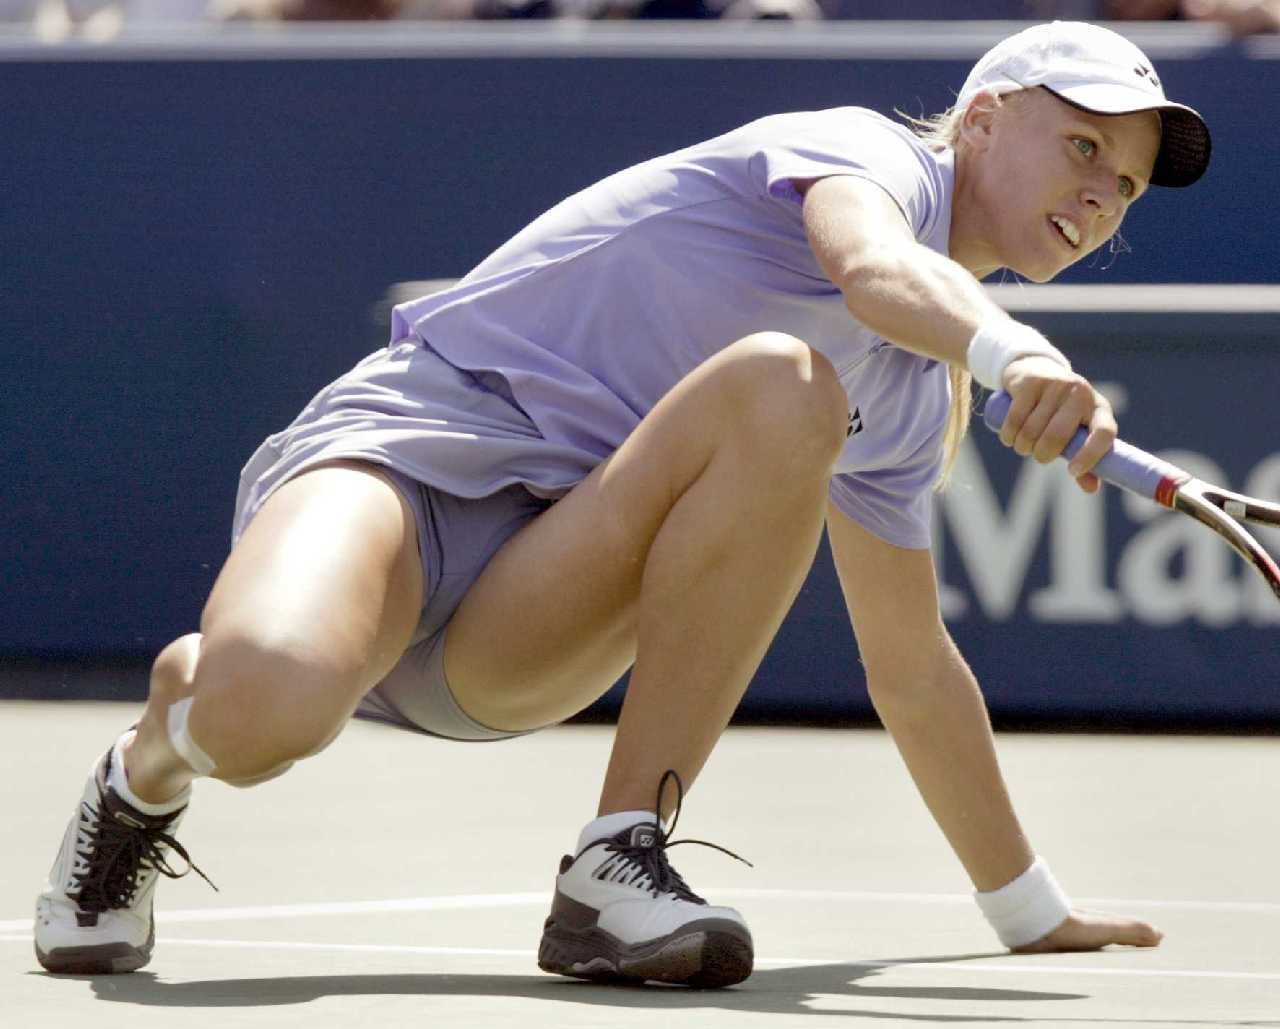 http://2.bp.blogspot.com/-TkX2yhCfUi8/Topwxv5DkGI/AAAAAAAAYUY/hpRhfKkU4Pw/s1600/Elena+Dementieva+Hot+Upskirt+Panties+on+tennis+court+12.jpg